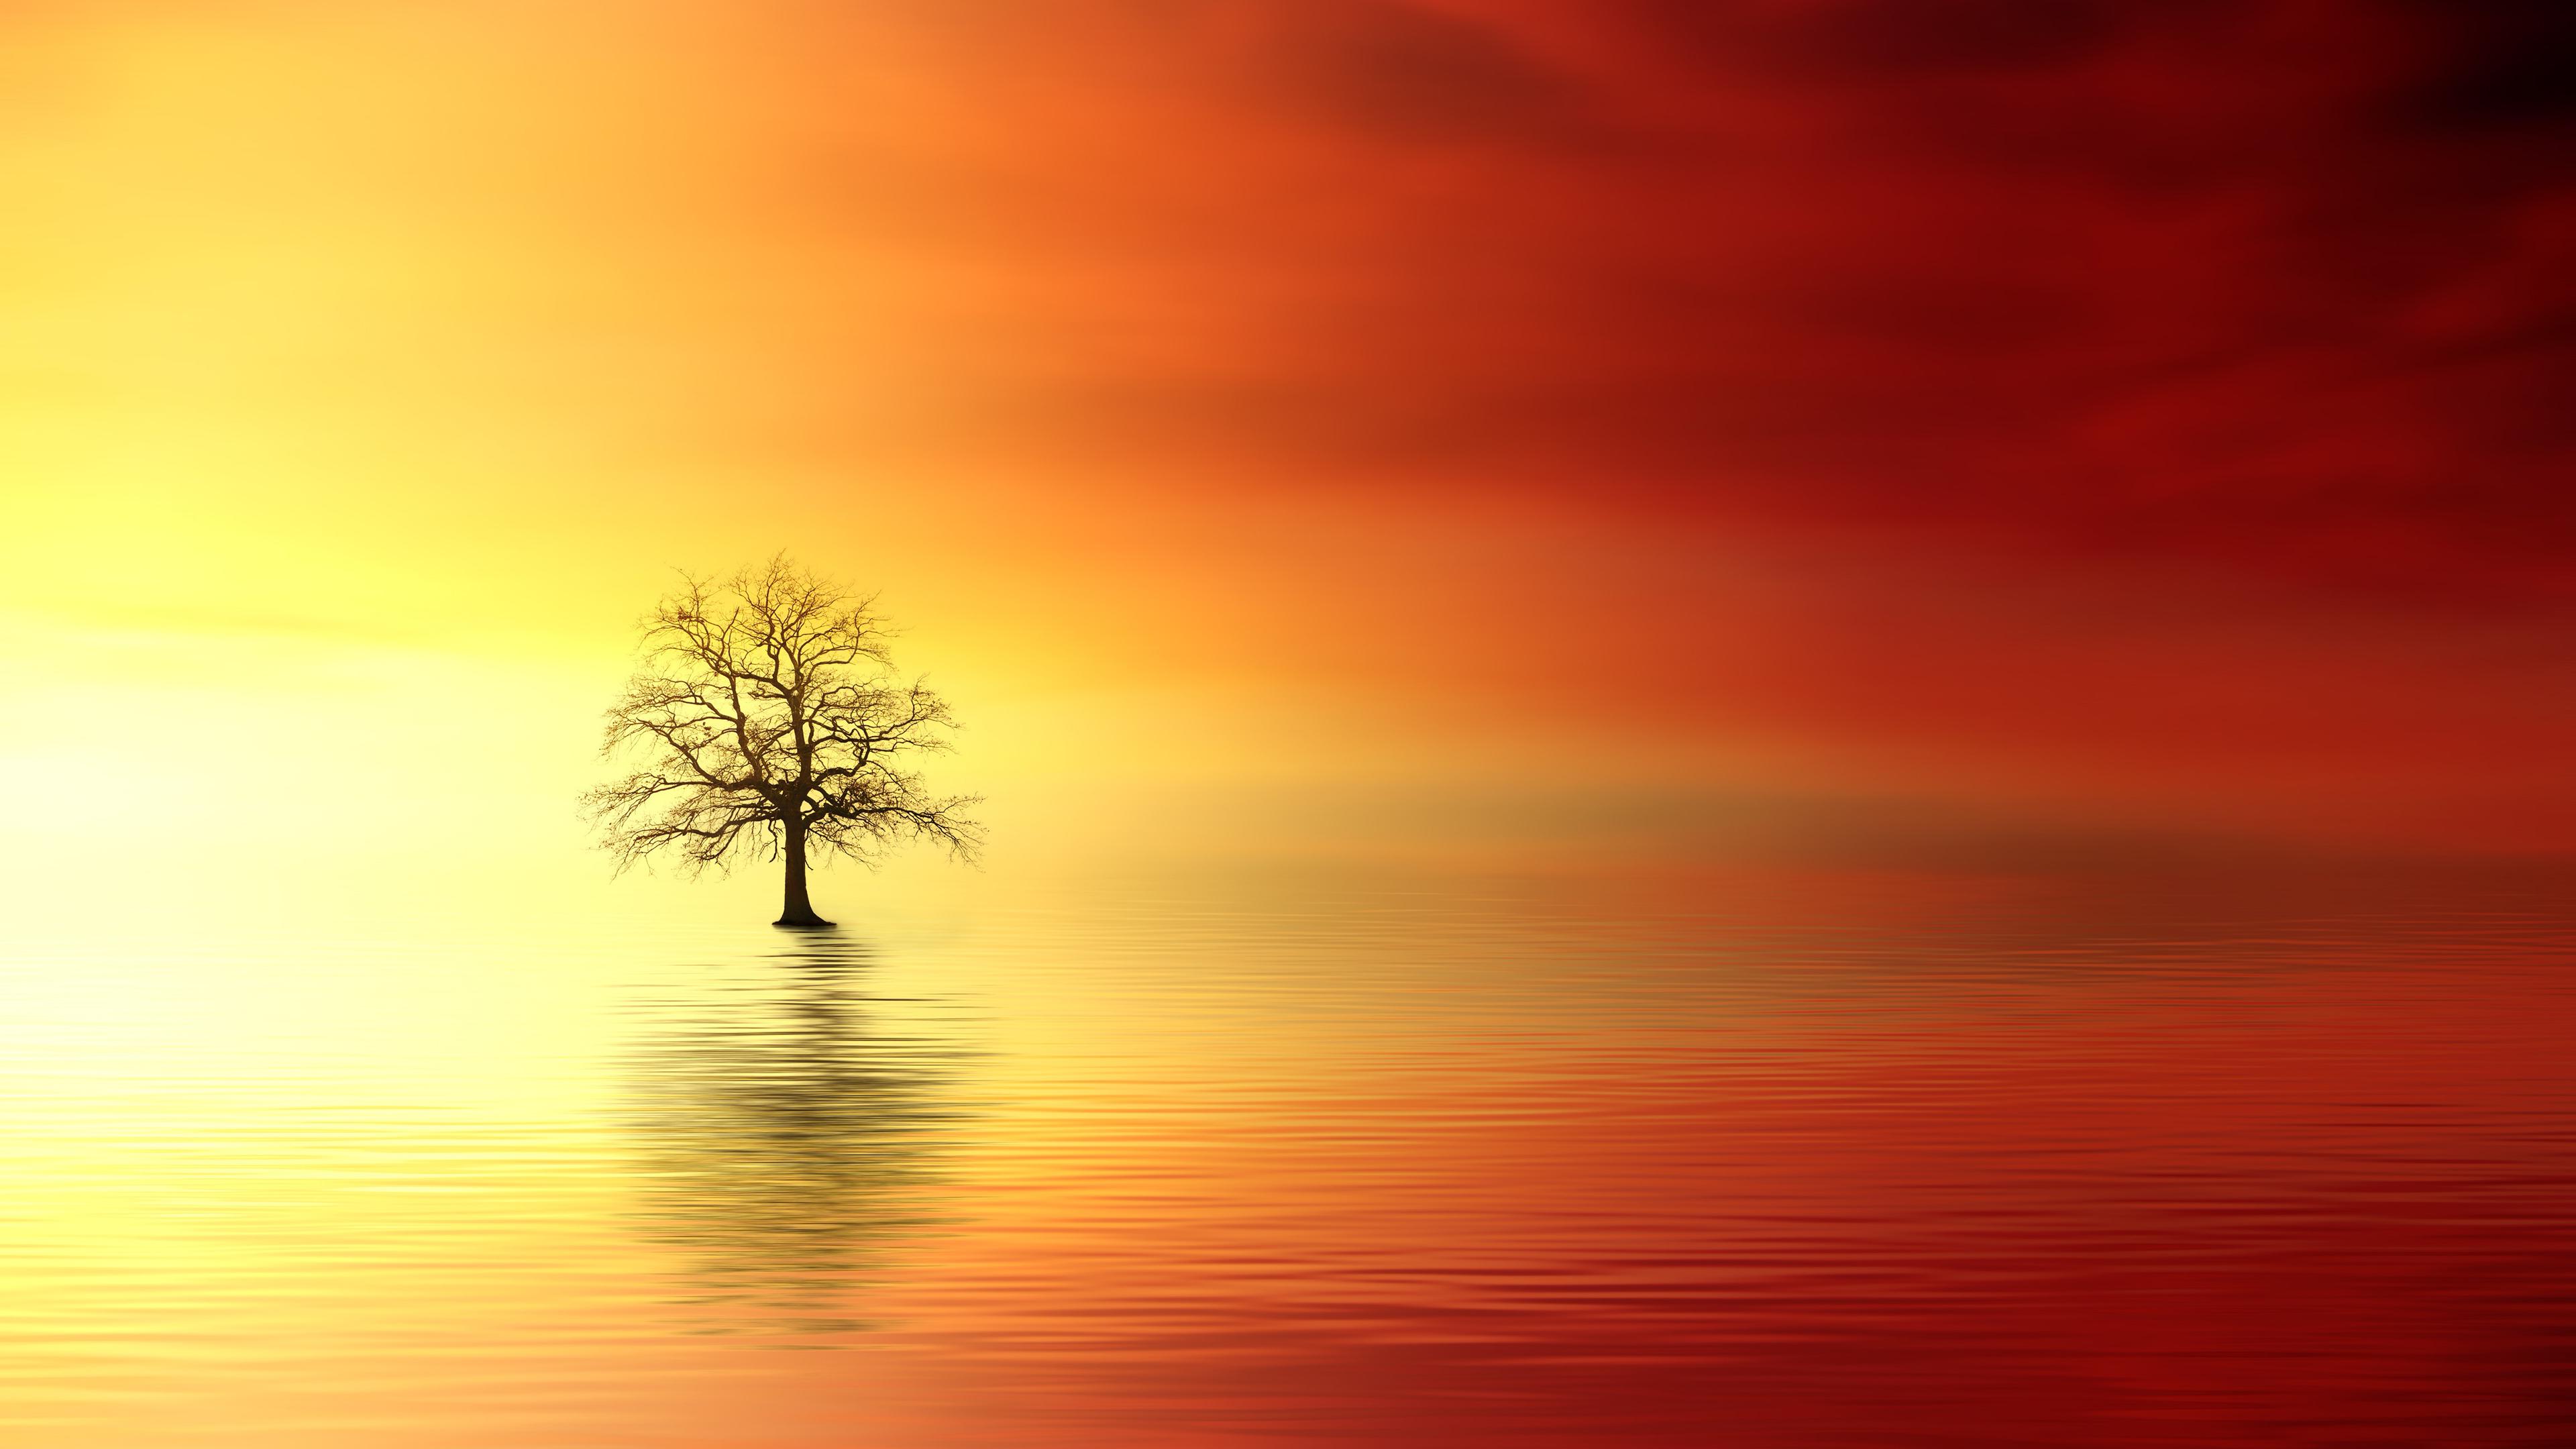 Vivid sunset chromebook wallpaper for Sfondi desktop tramonti mare